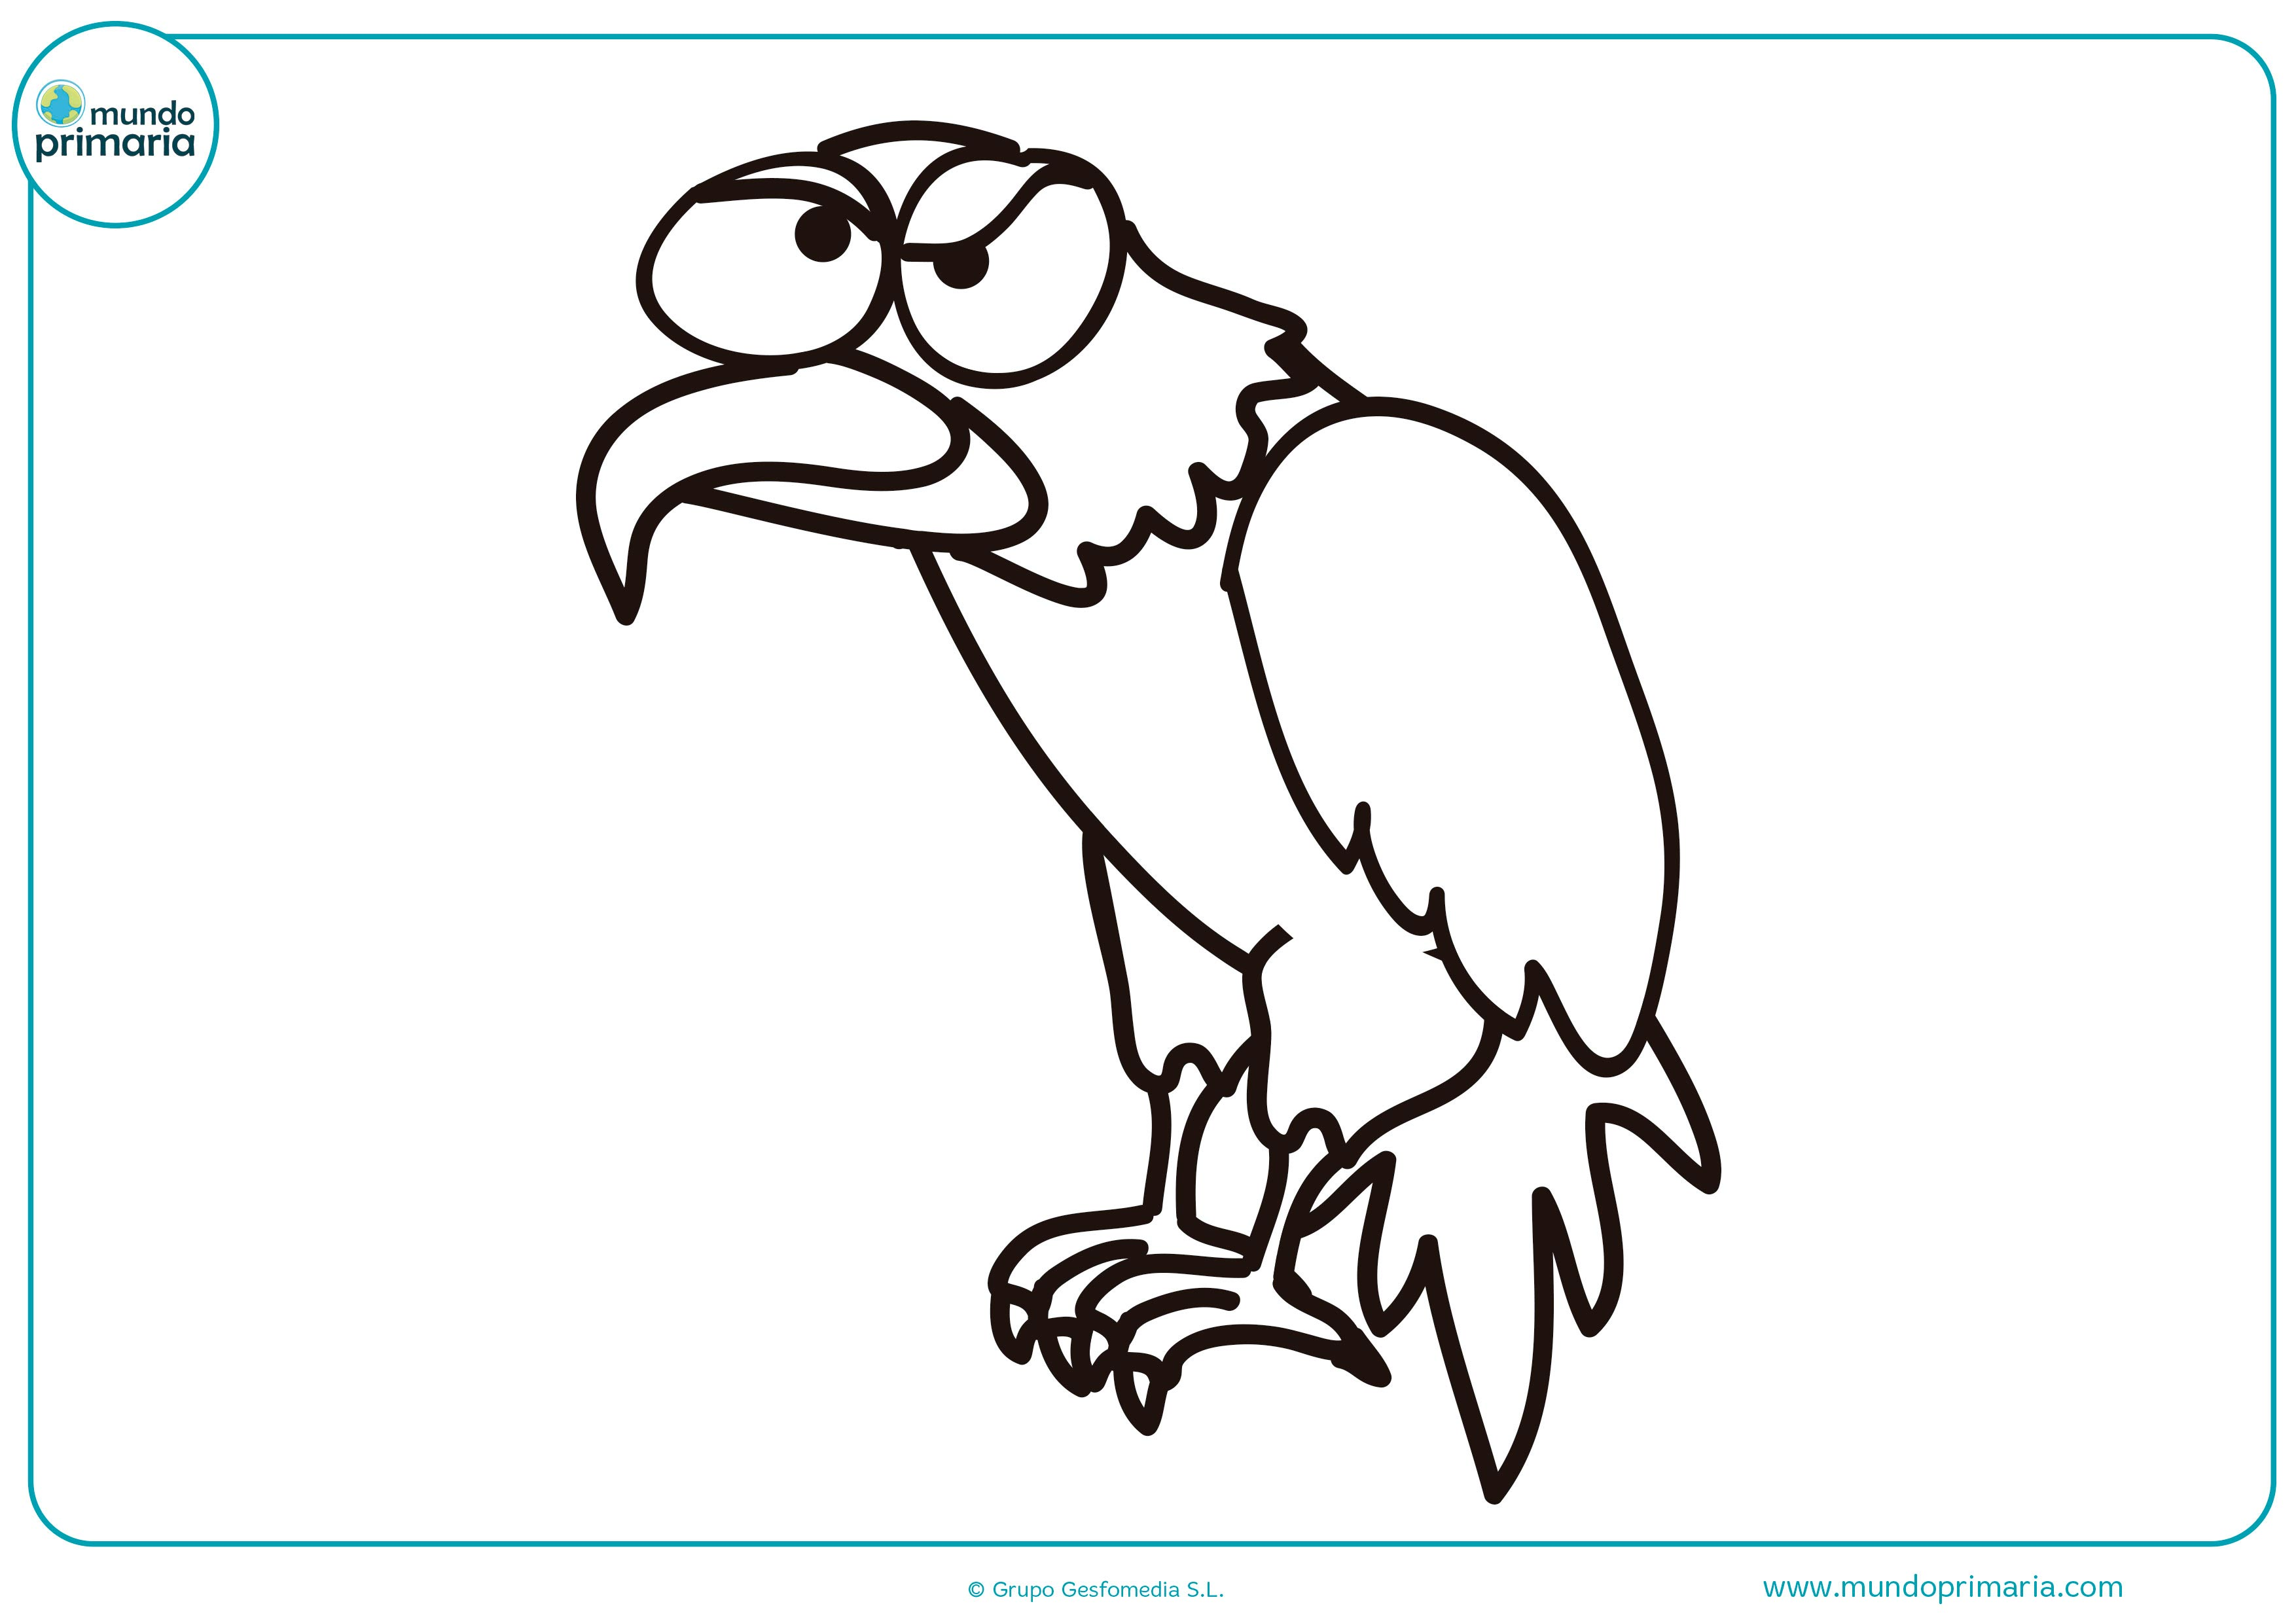 Dorable Dibujo Para Colorear águila Americana Friso - Dibujos Para ...